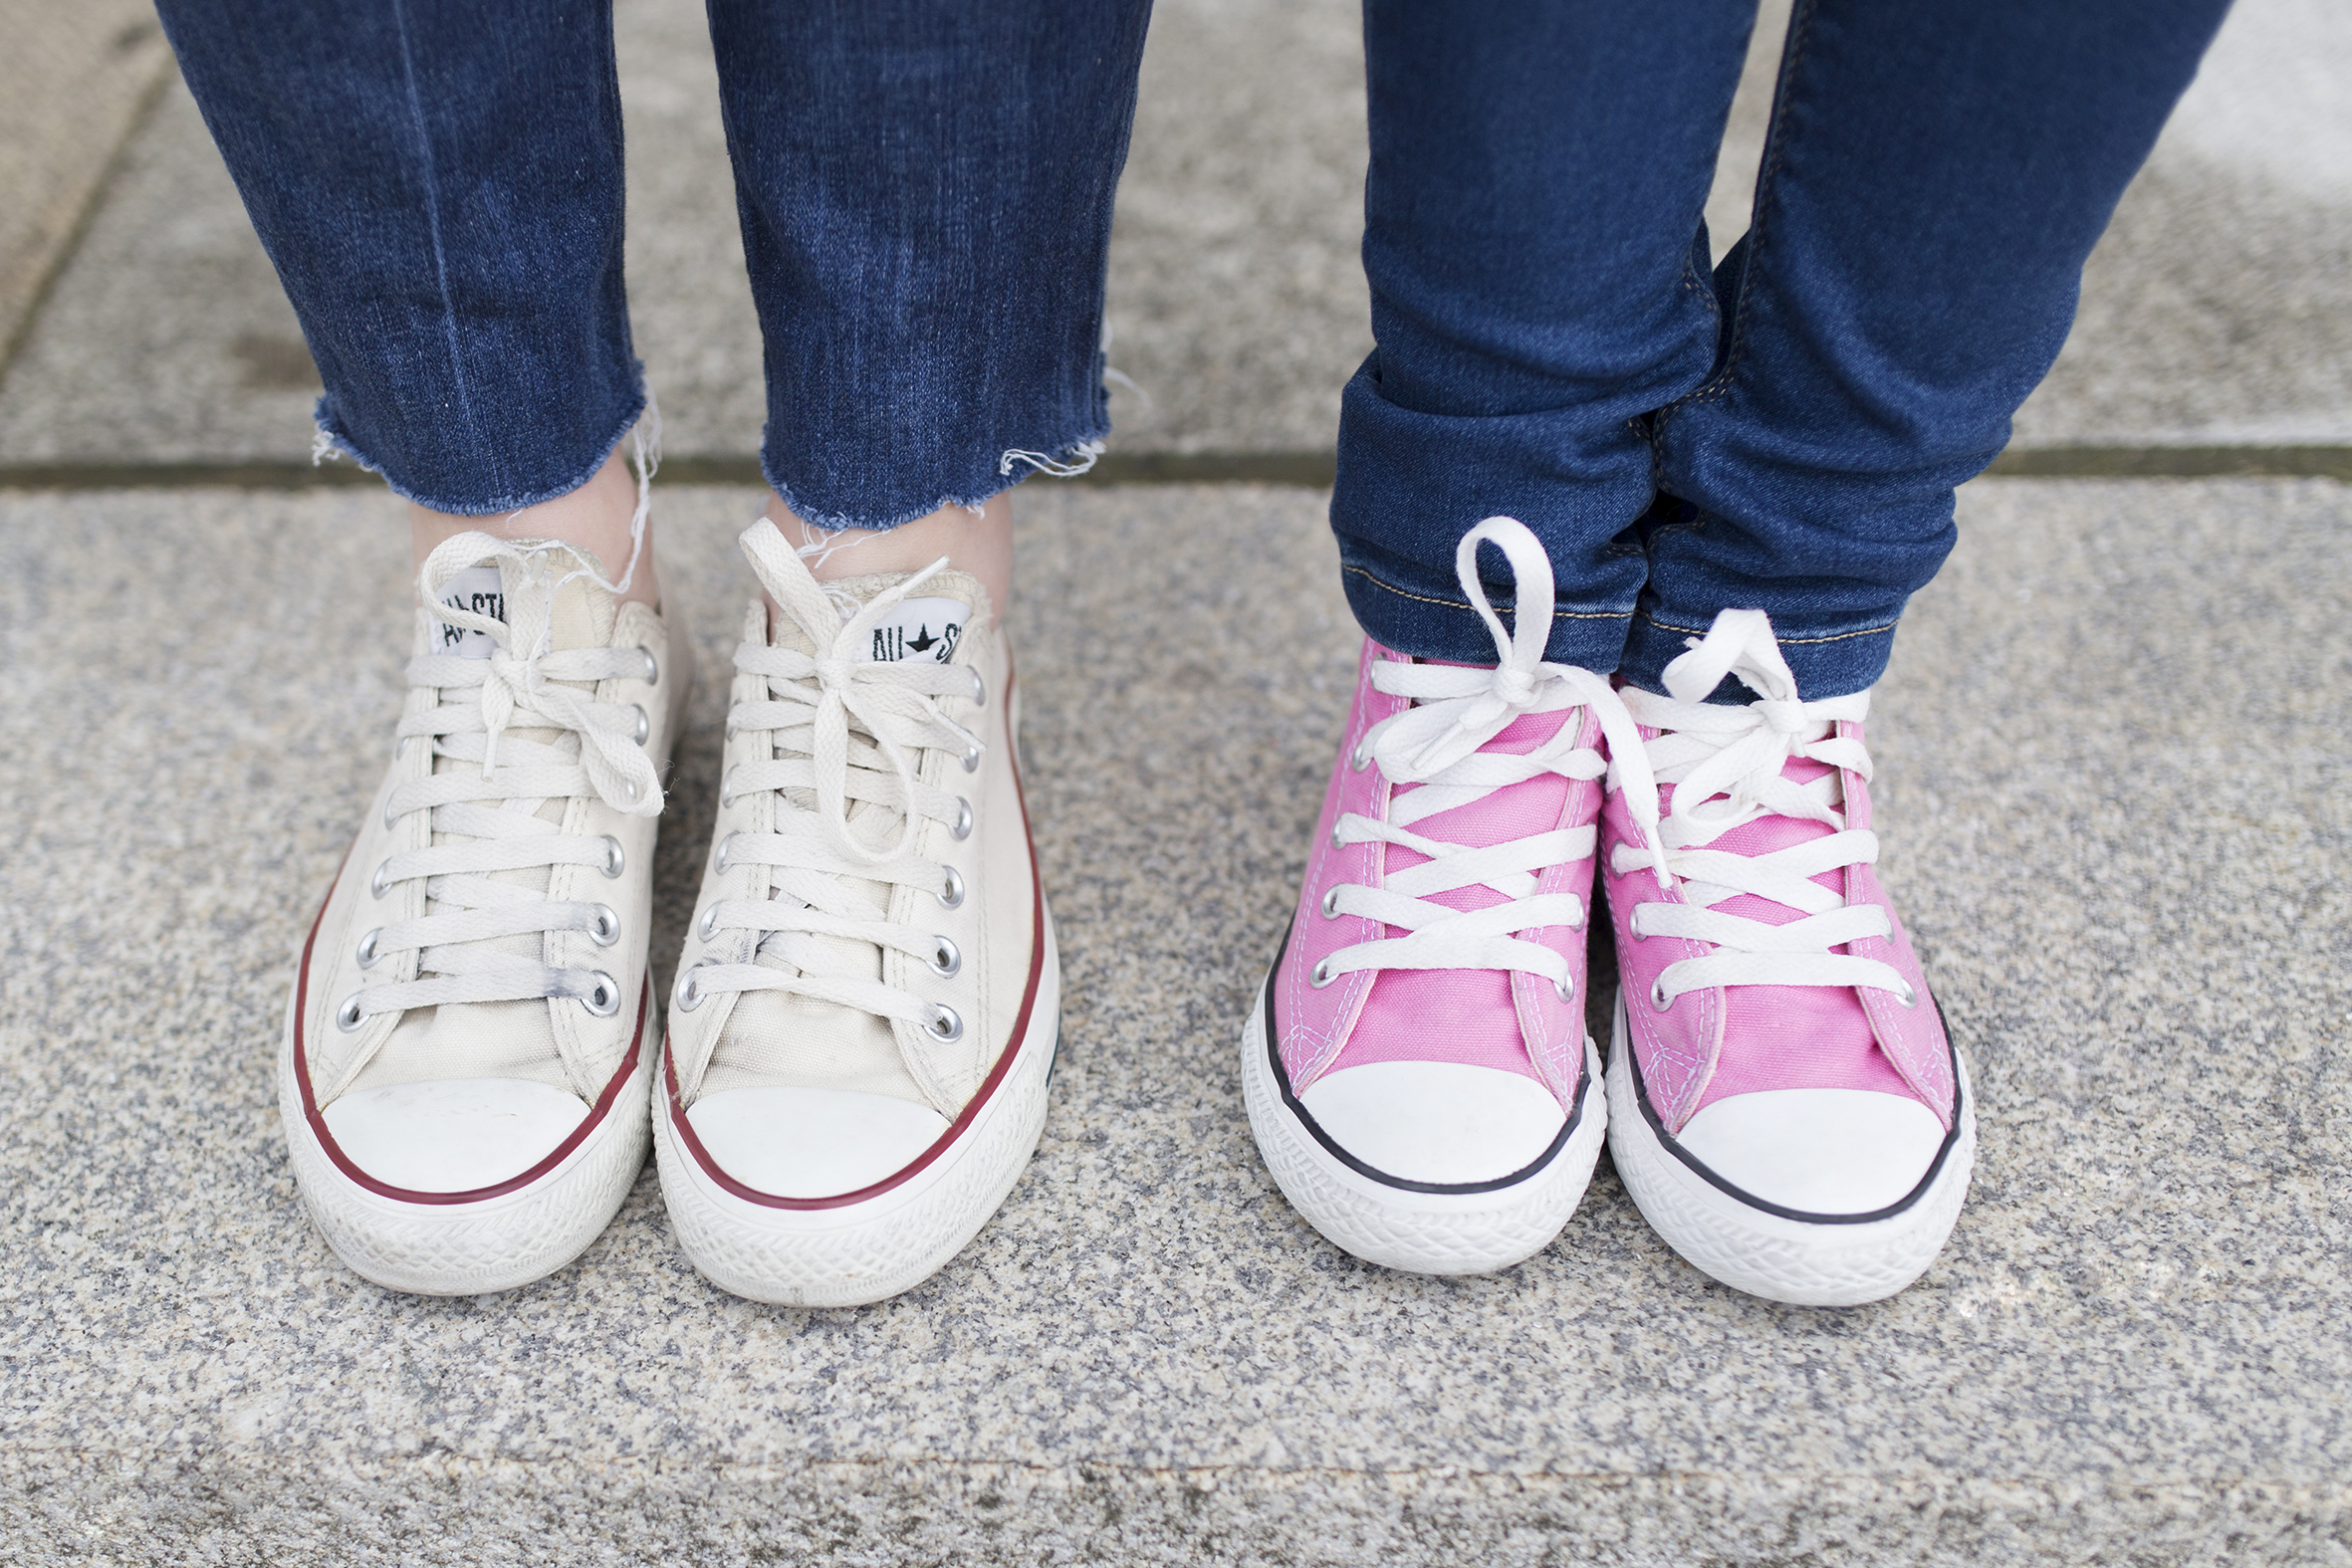 converse-jimena & me-madre e hija-Viajar en familia-descalzaporelparque-coruña-lifestyle- kids- converse-daughter